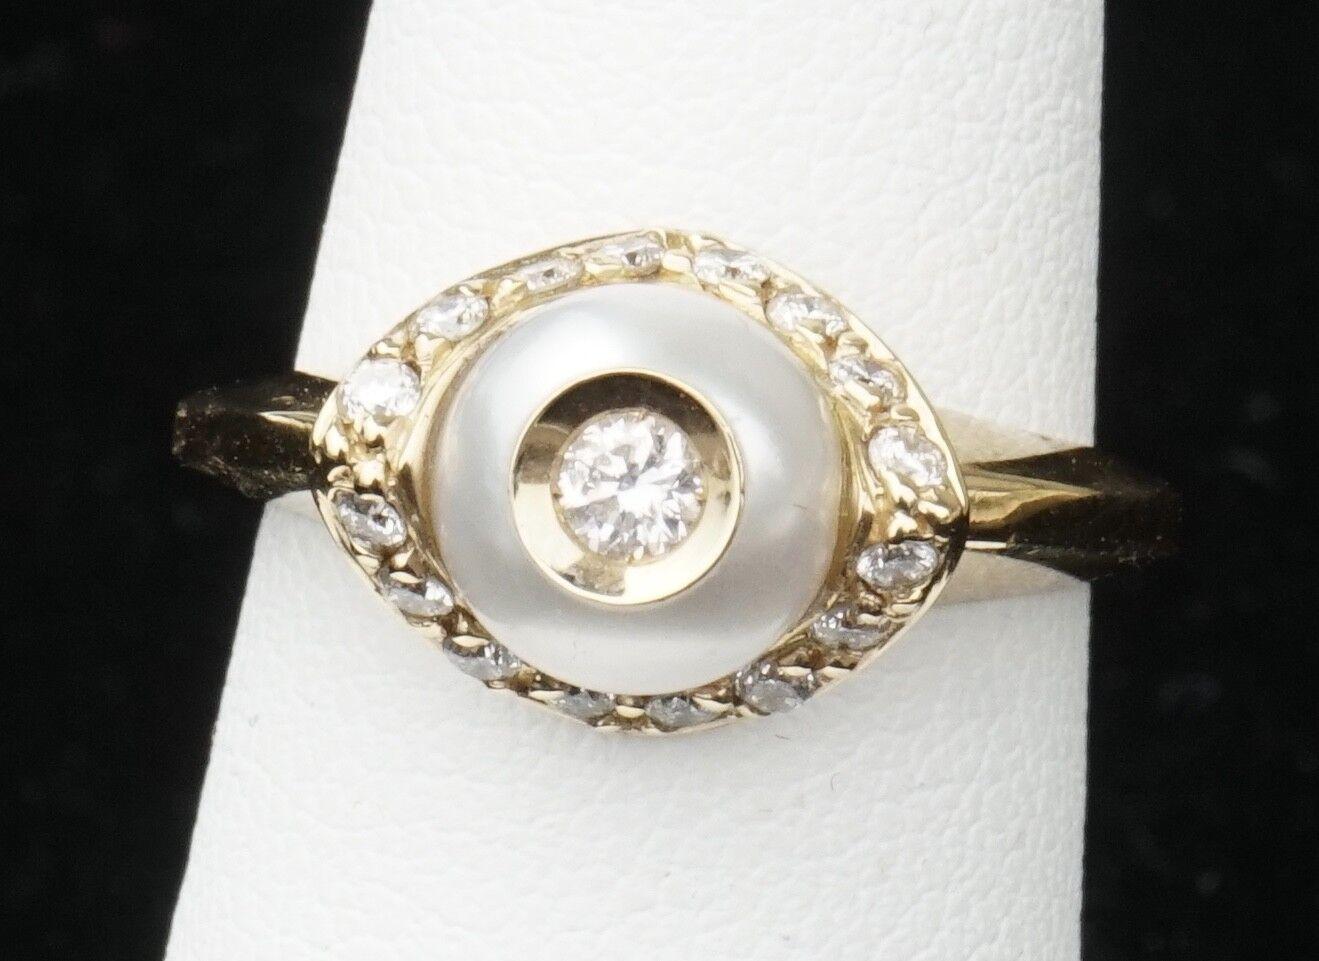 364bc40637ab6 Galatea Yellow 14K Diamond gold 6 Size Ring Pearl A in zgye492153831 ...